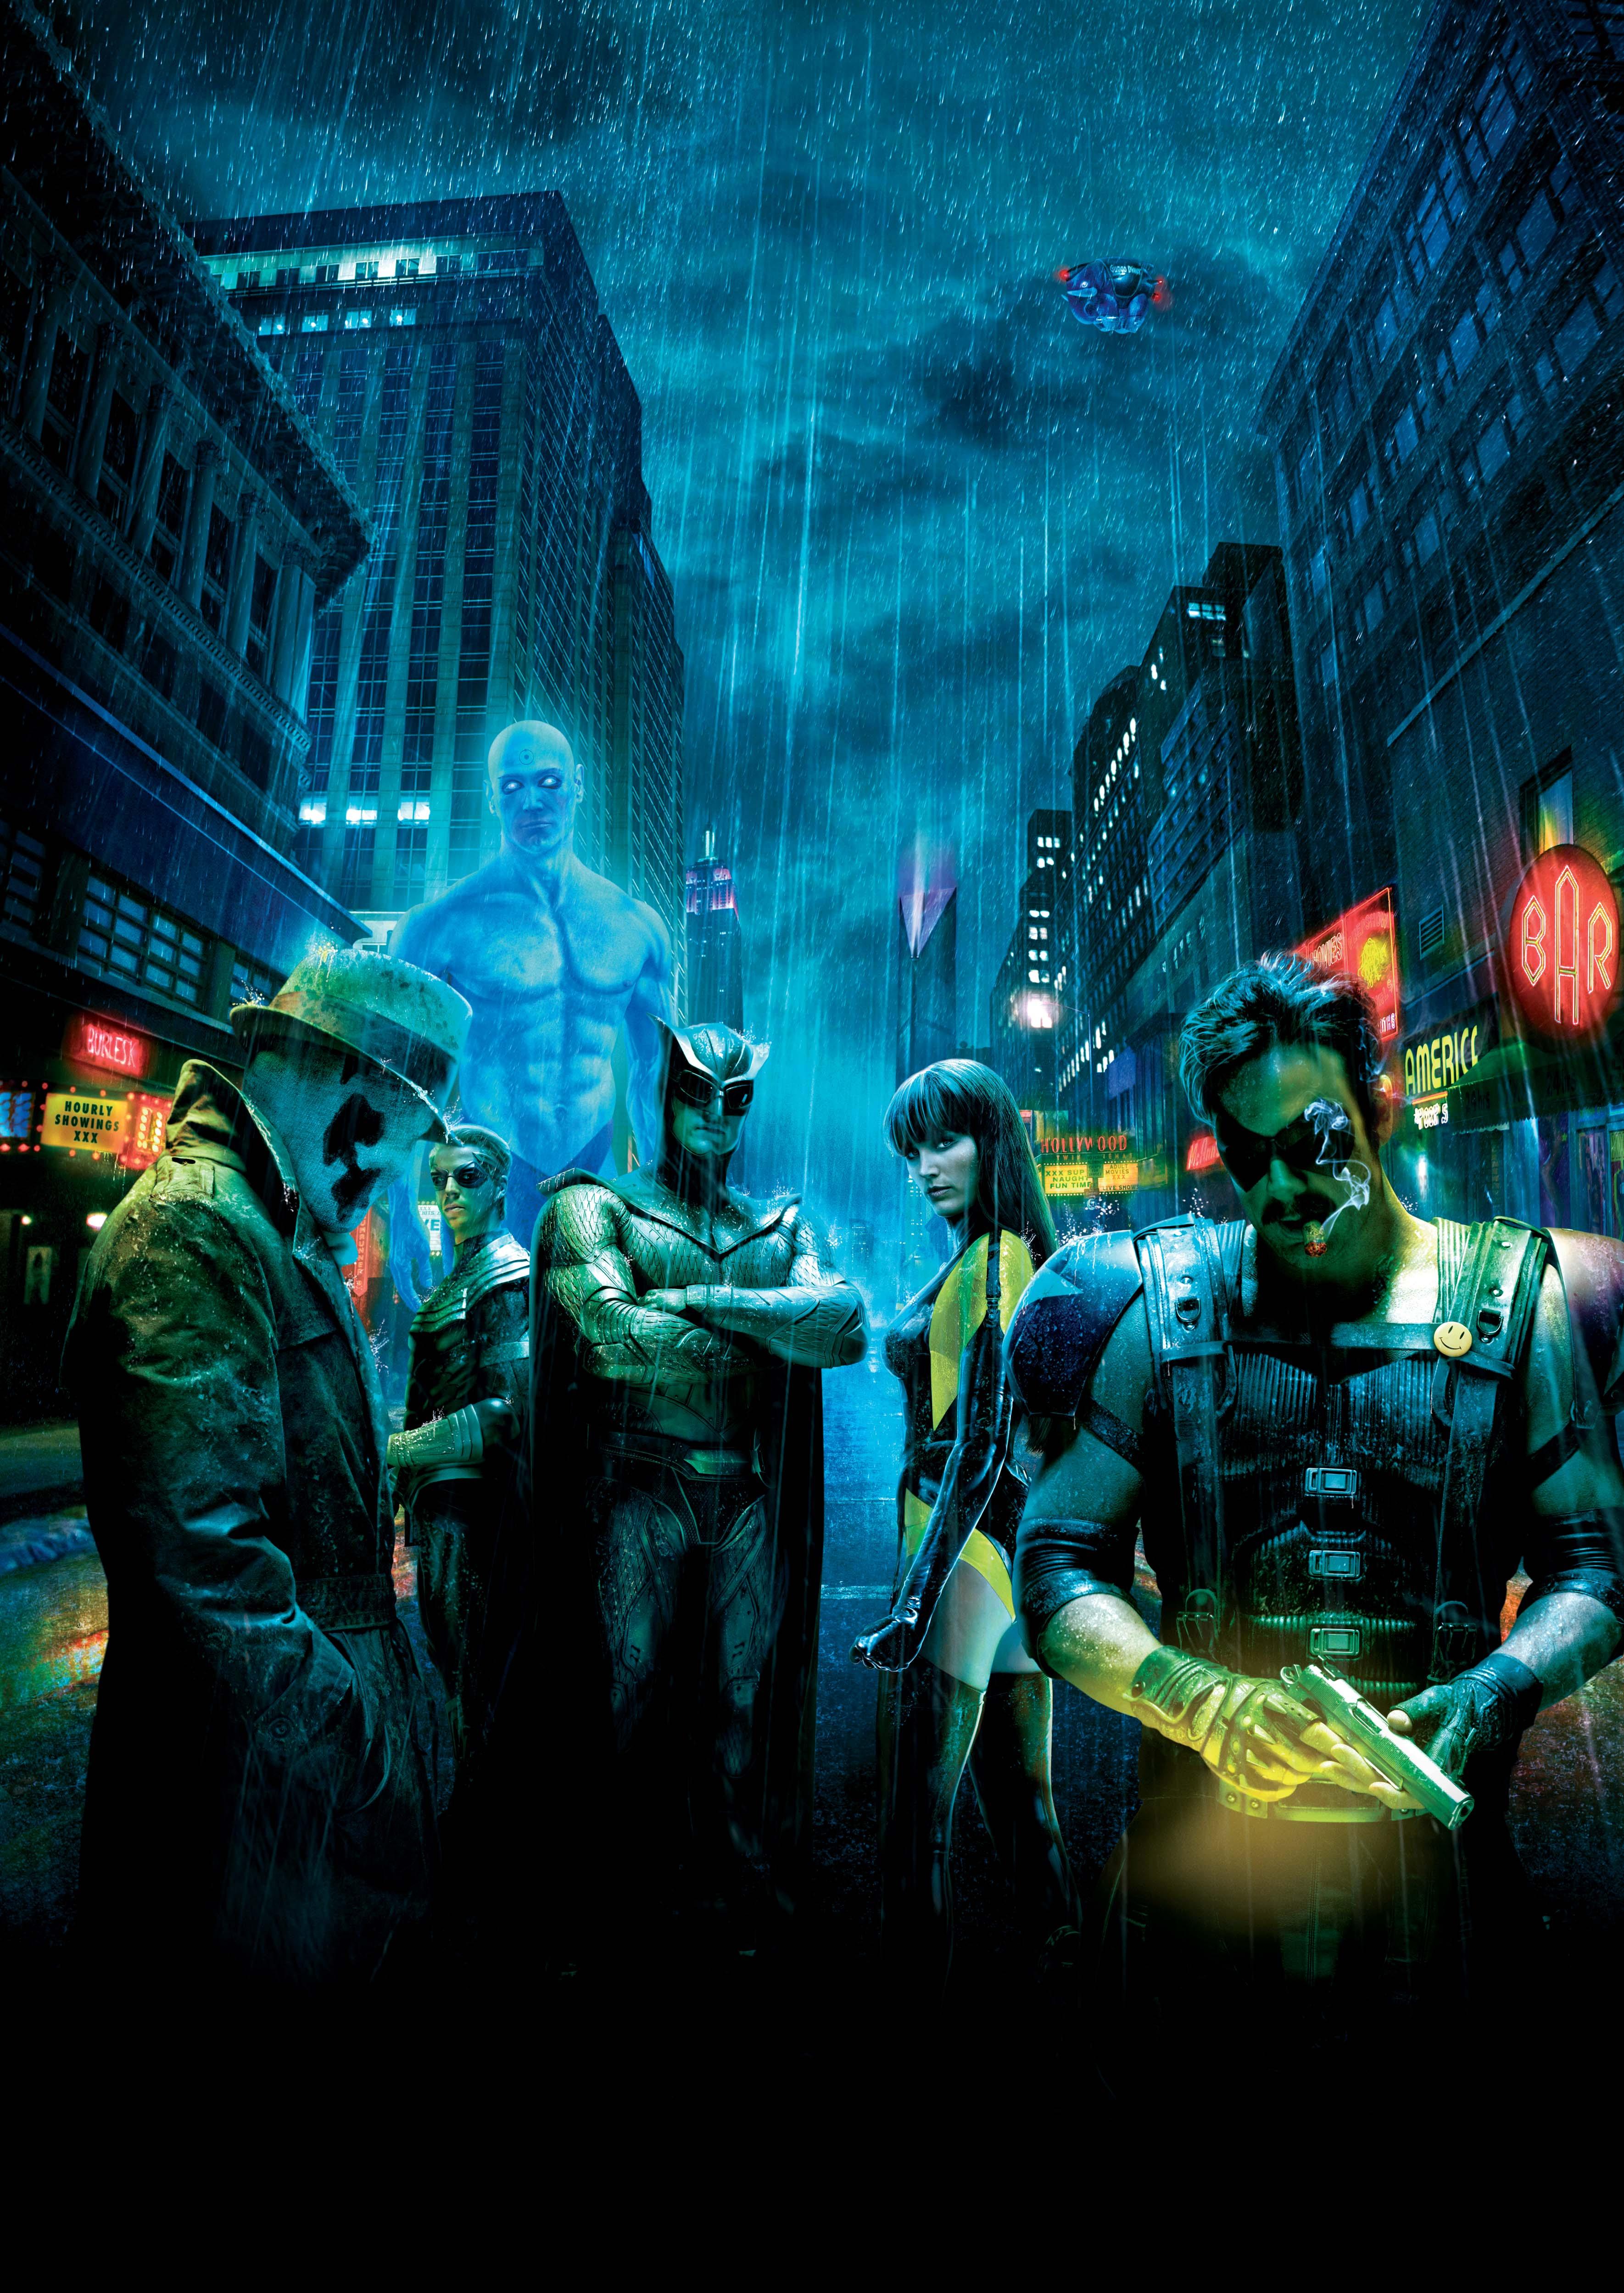 Watchmen, Rorschach, Silk Spectre, The